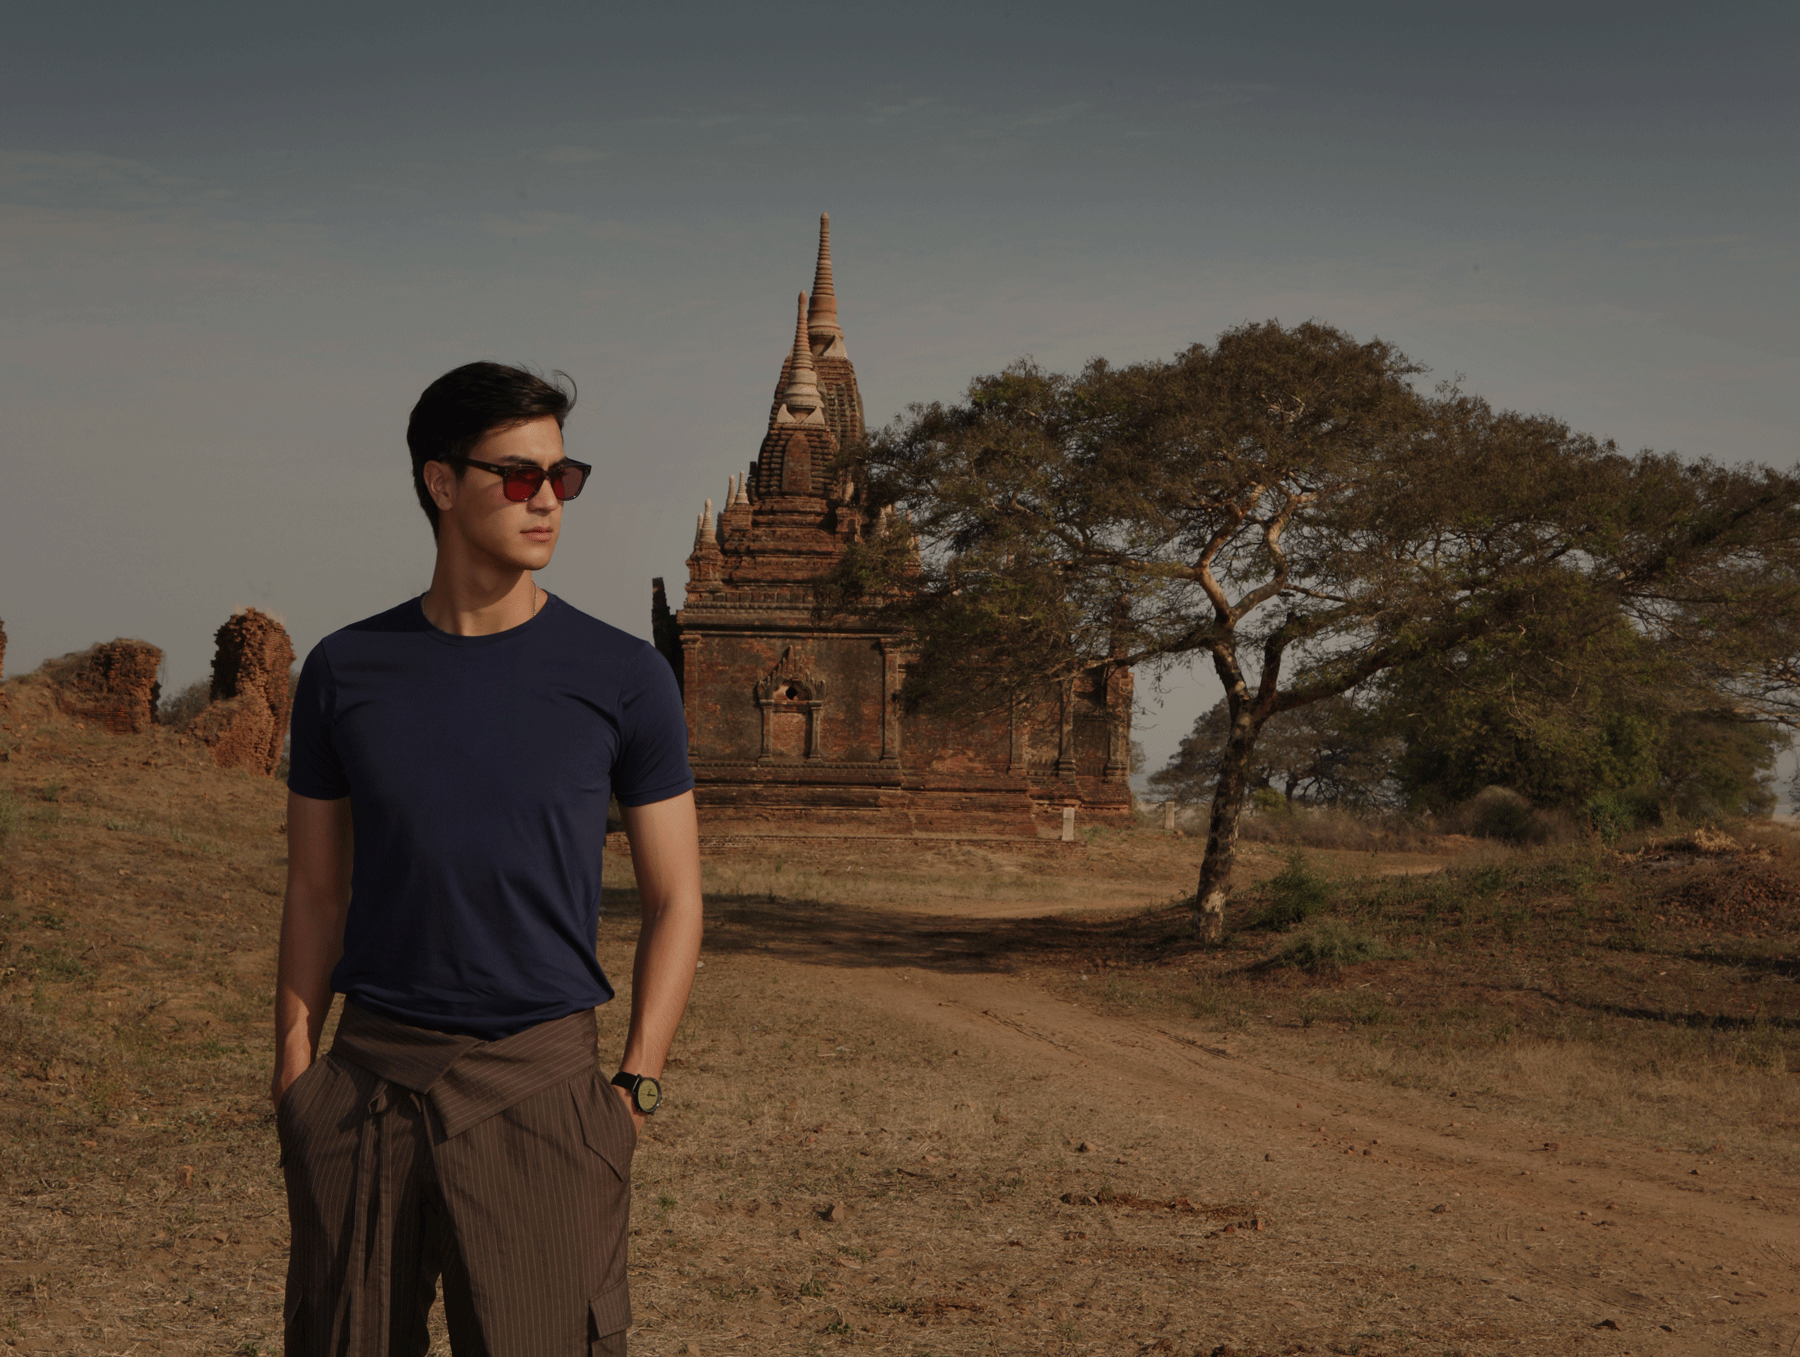 Old Bagan Pagoda  Tshirt : JOCKEY / pants : SARIT / sunglasses : SPEKTRE / watch : FORREST